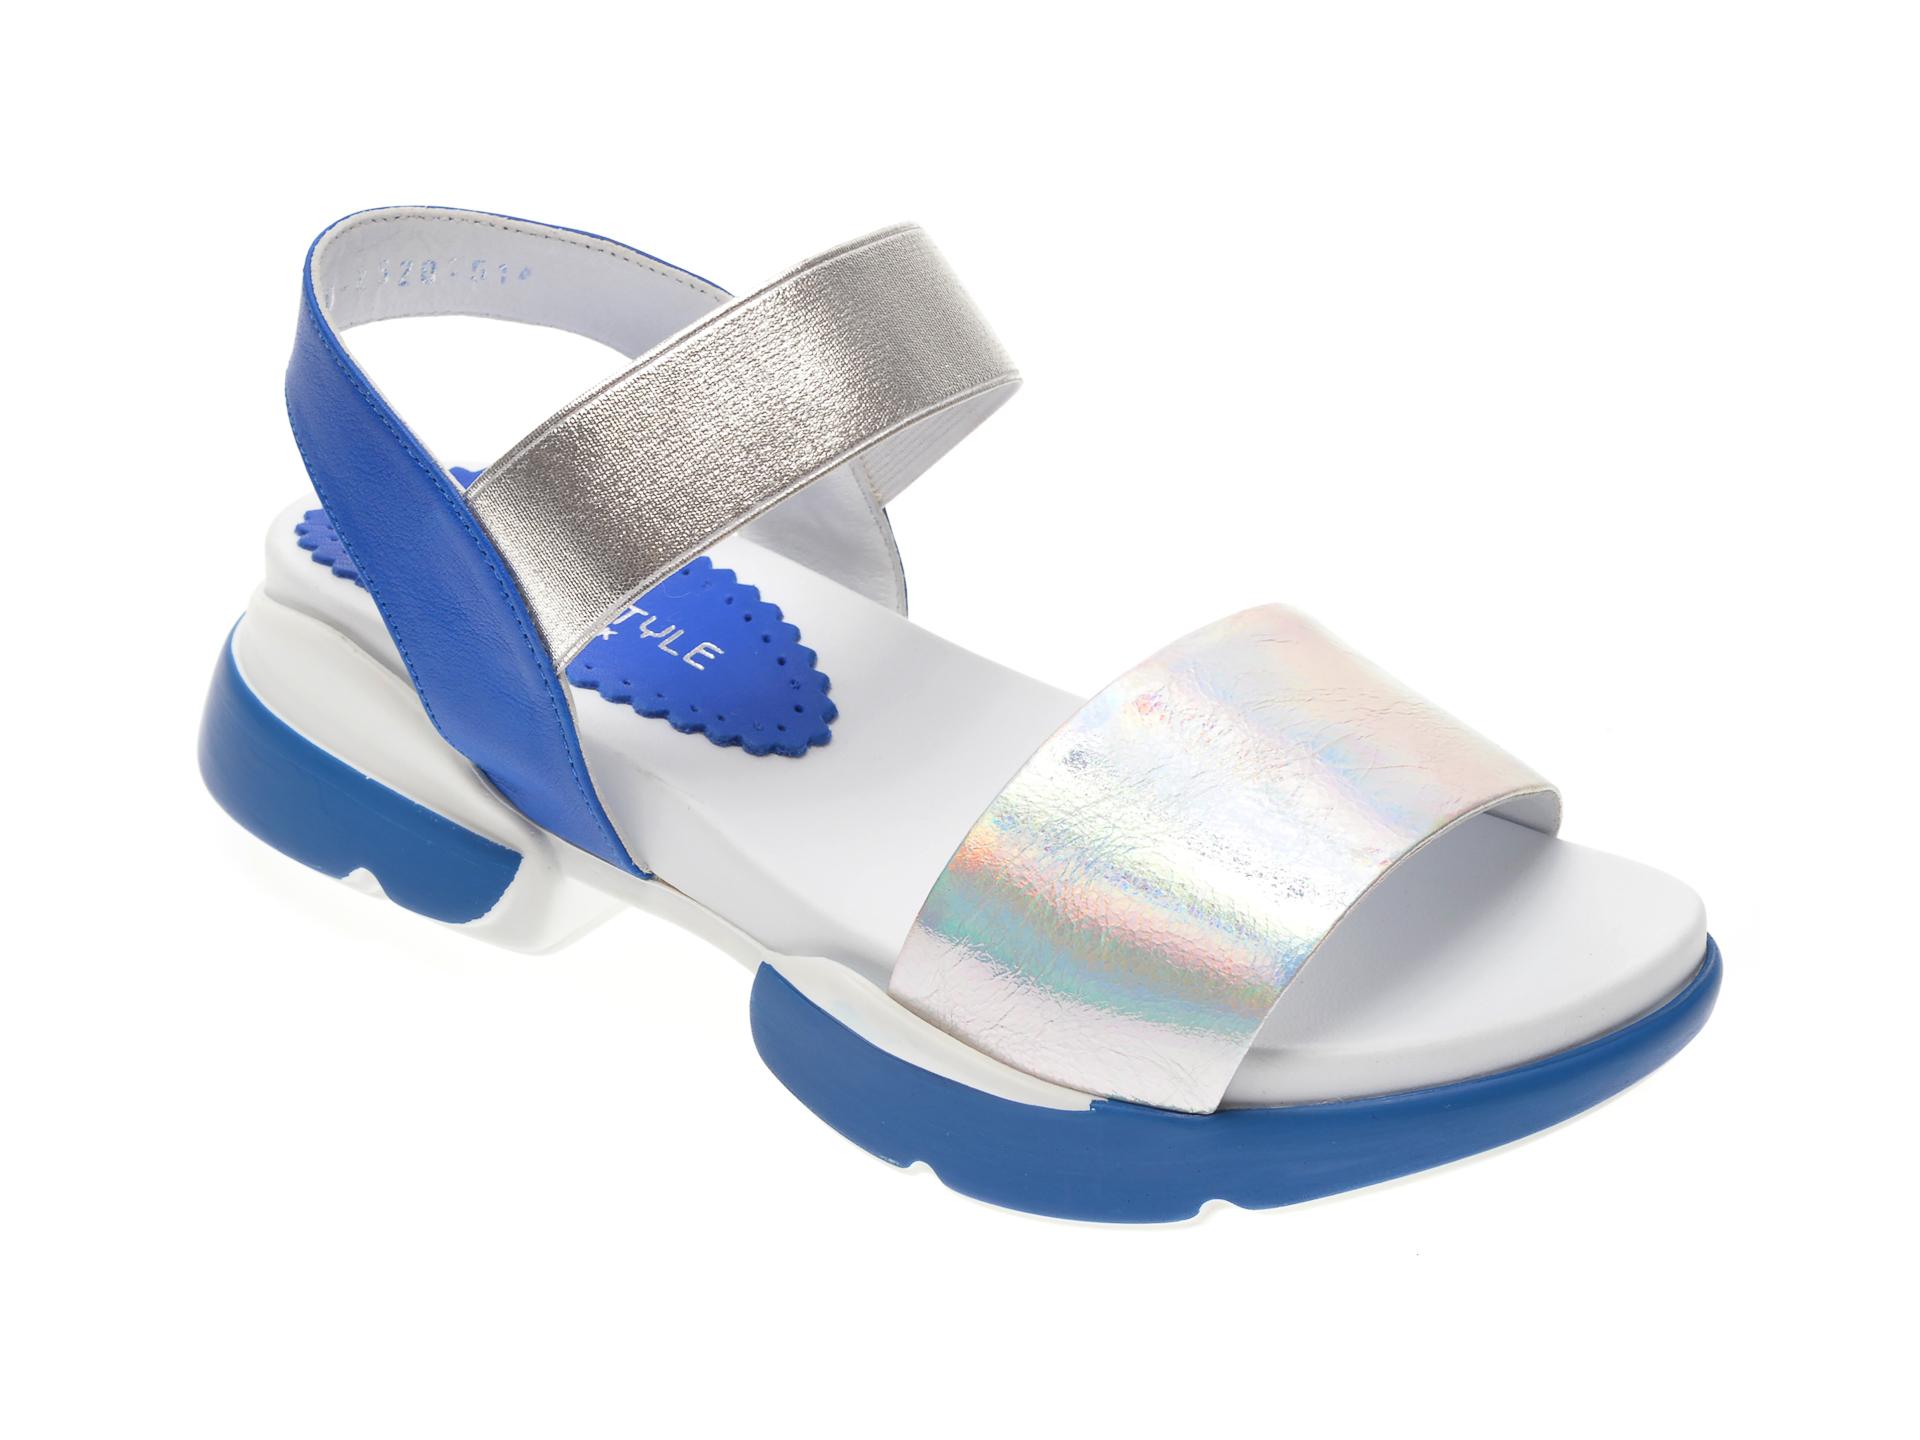 Sandale MISS LIZA argintii, 1182520, din piele naturala imagine